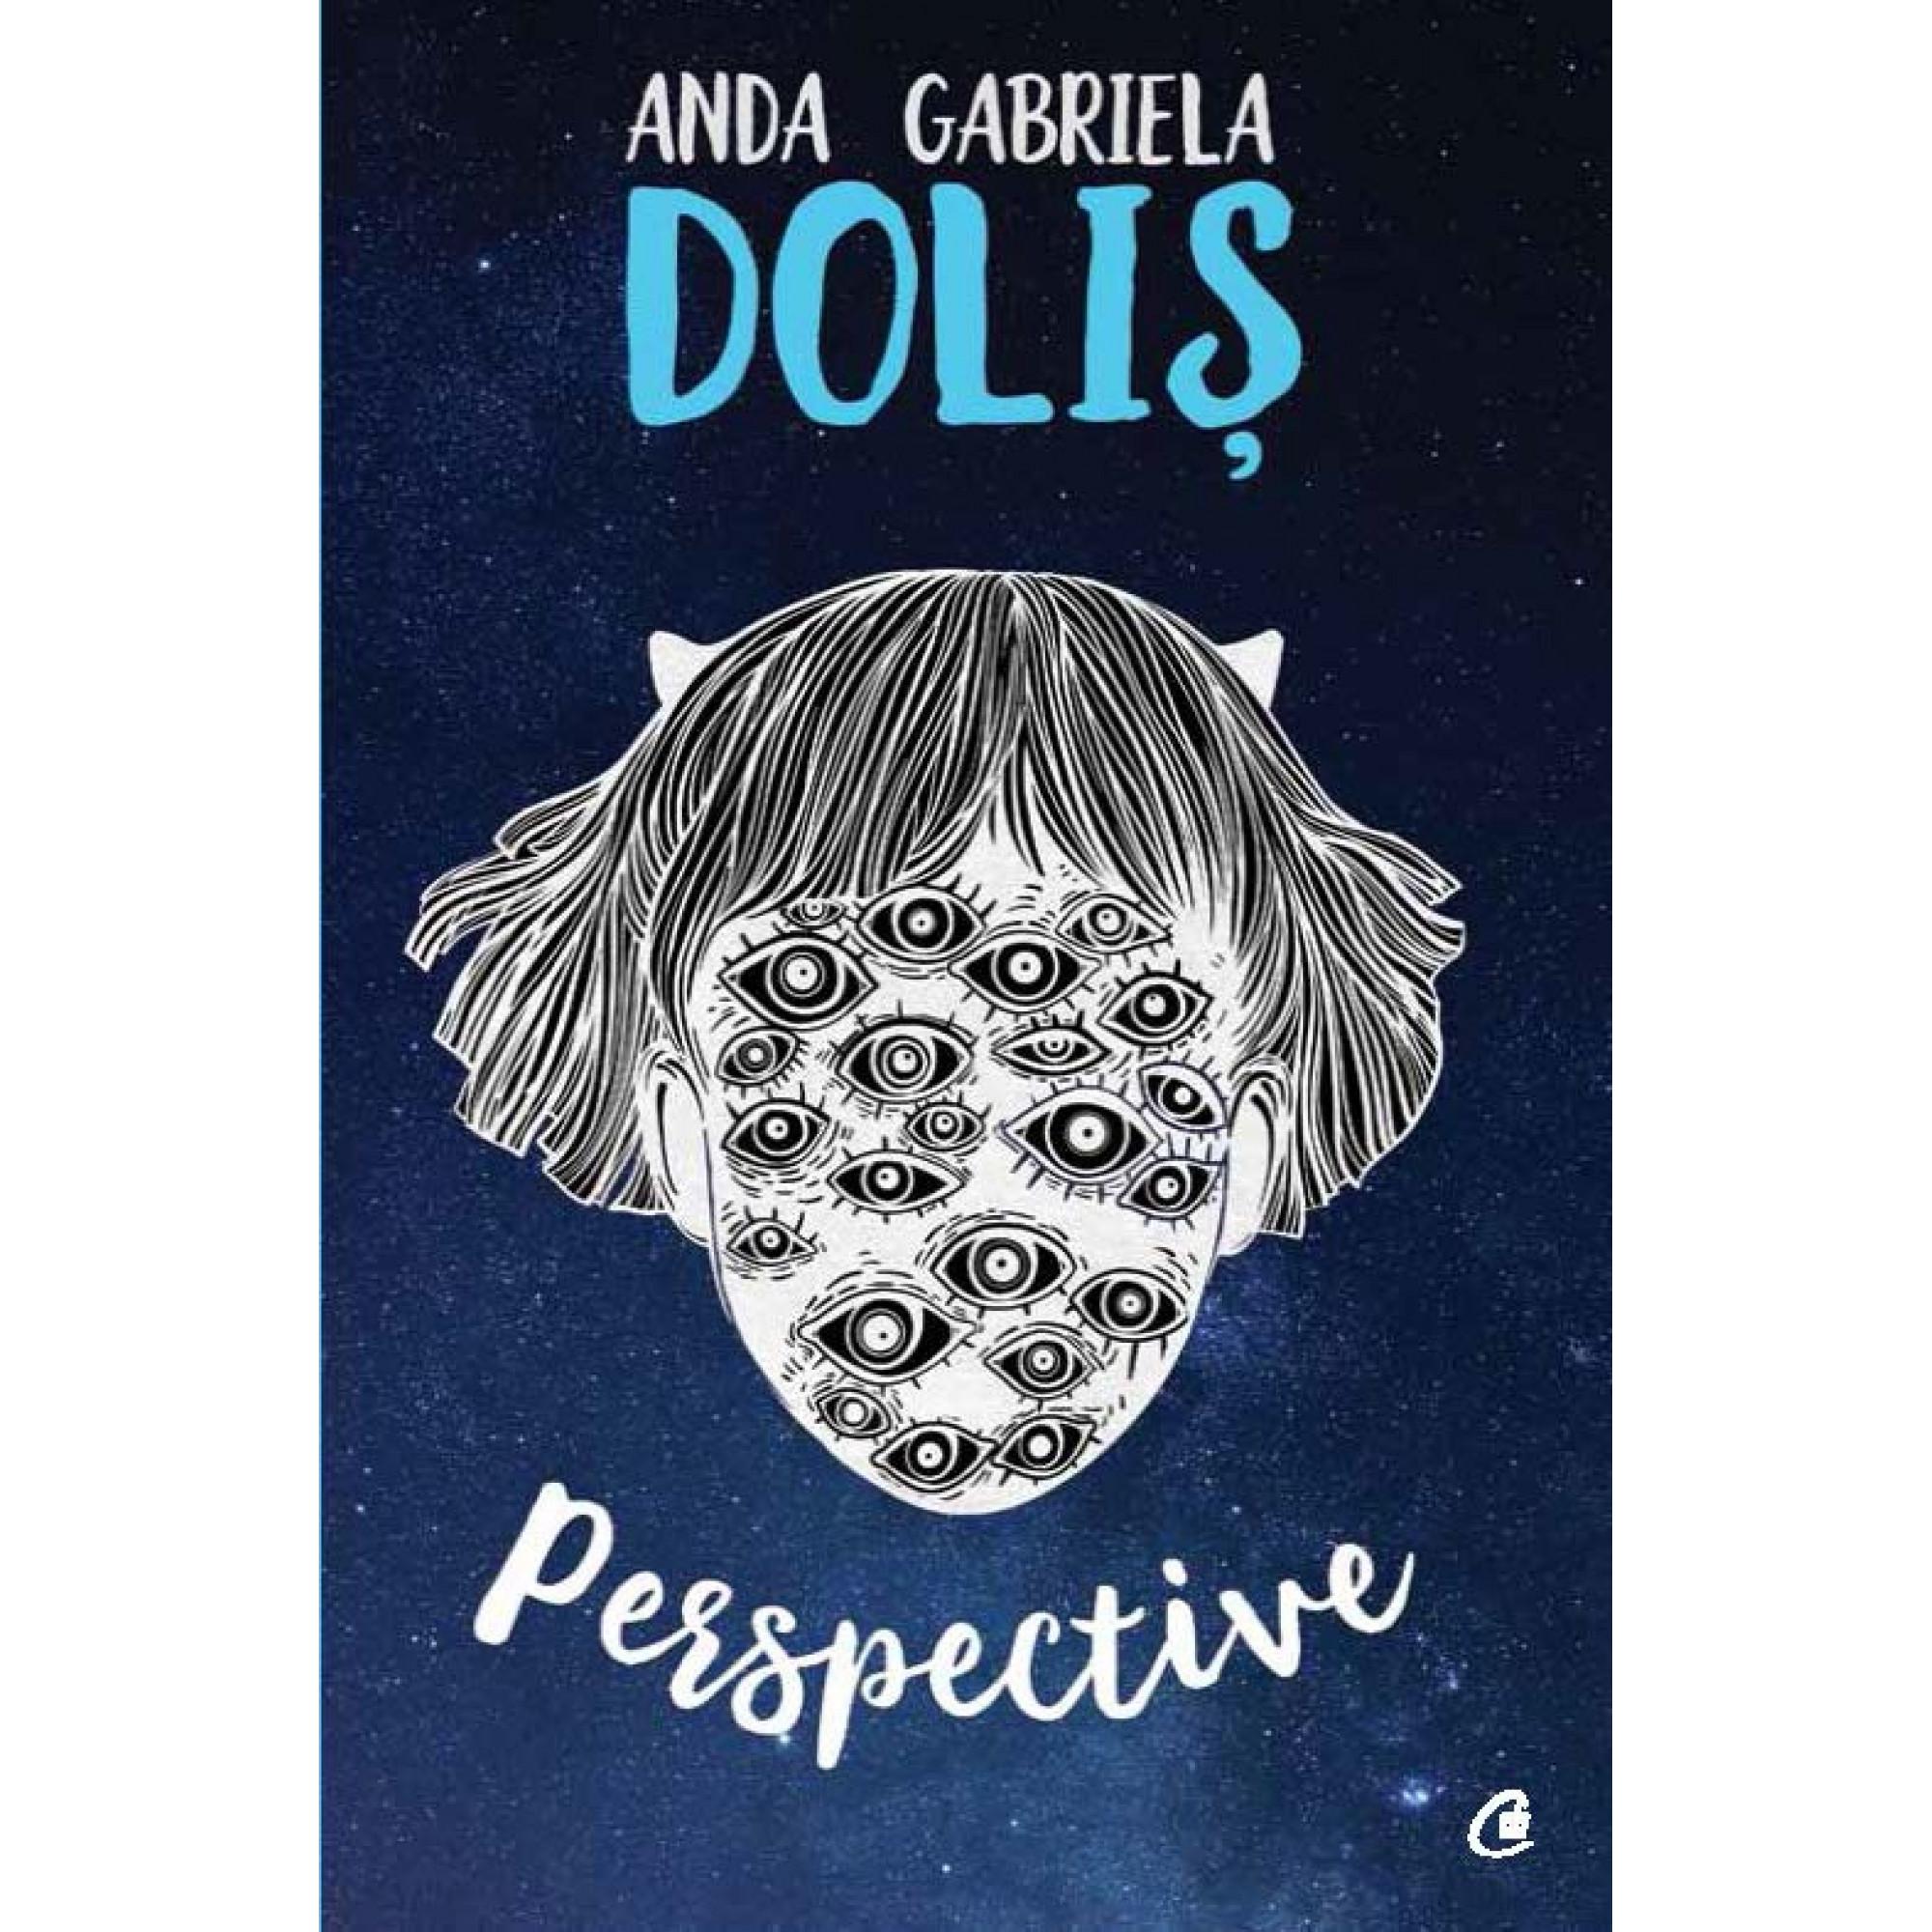 Perspective; Anda Gabriela Doliș